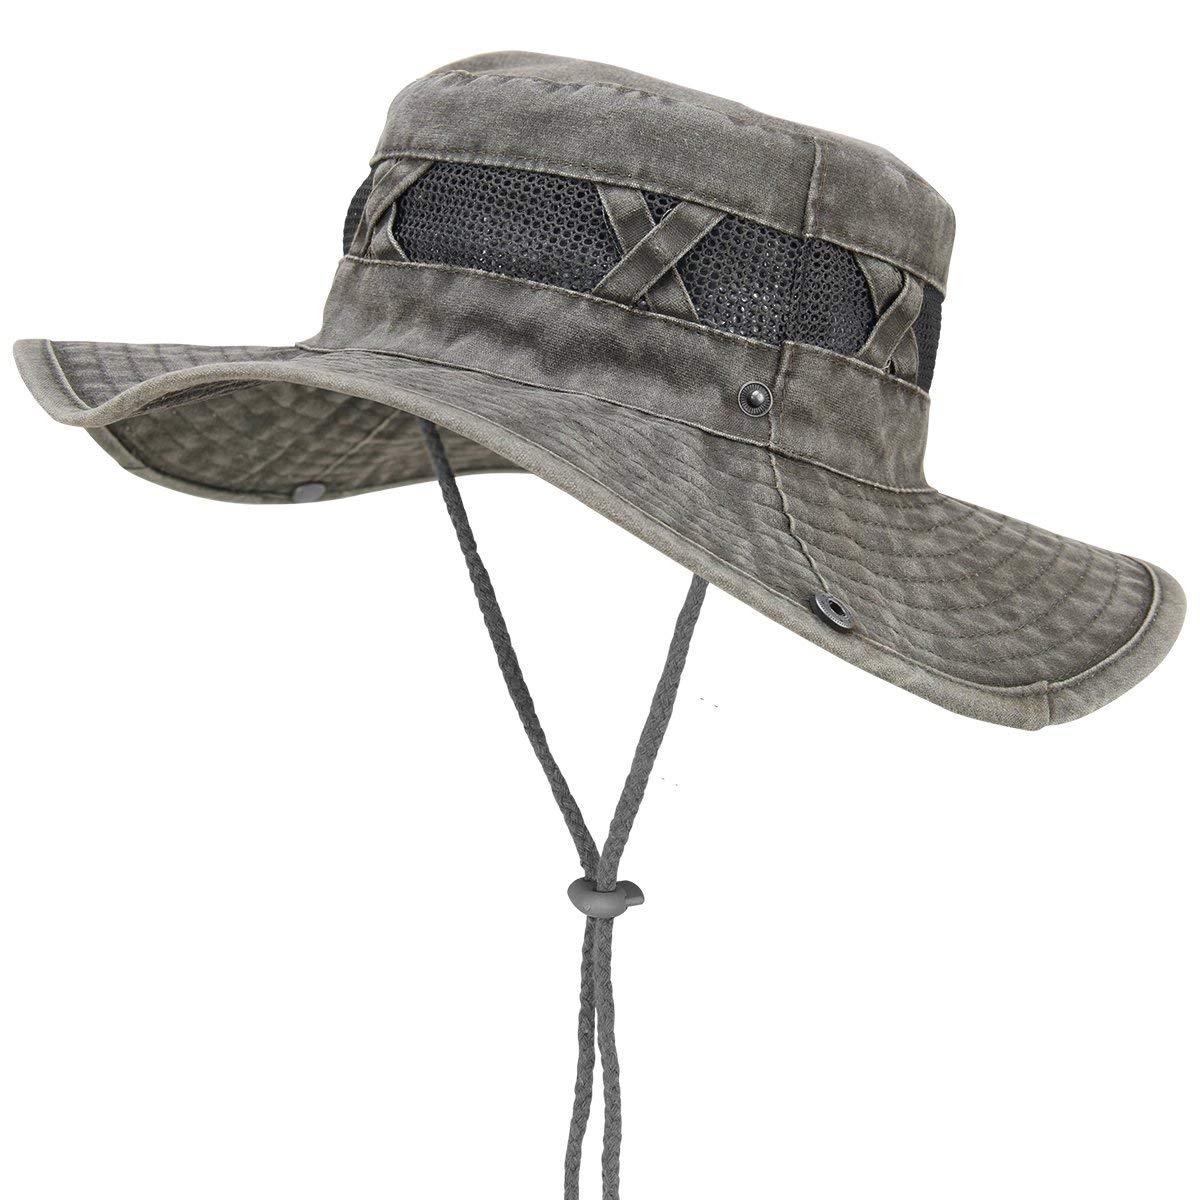 9de2469e0c0f2 Get Quotations · Bodvera Outdoor Sun Protection Wide Brim Boonie Hat Bucket  Safari Hunting Fishing Summer Cap